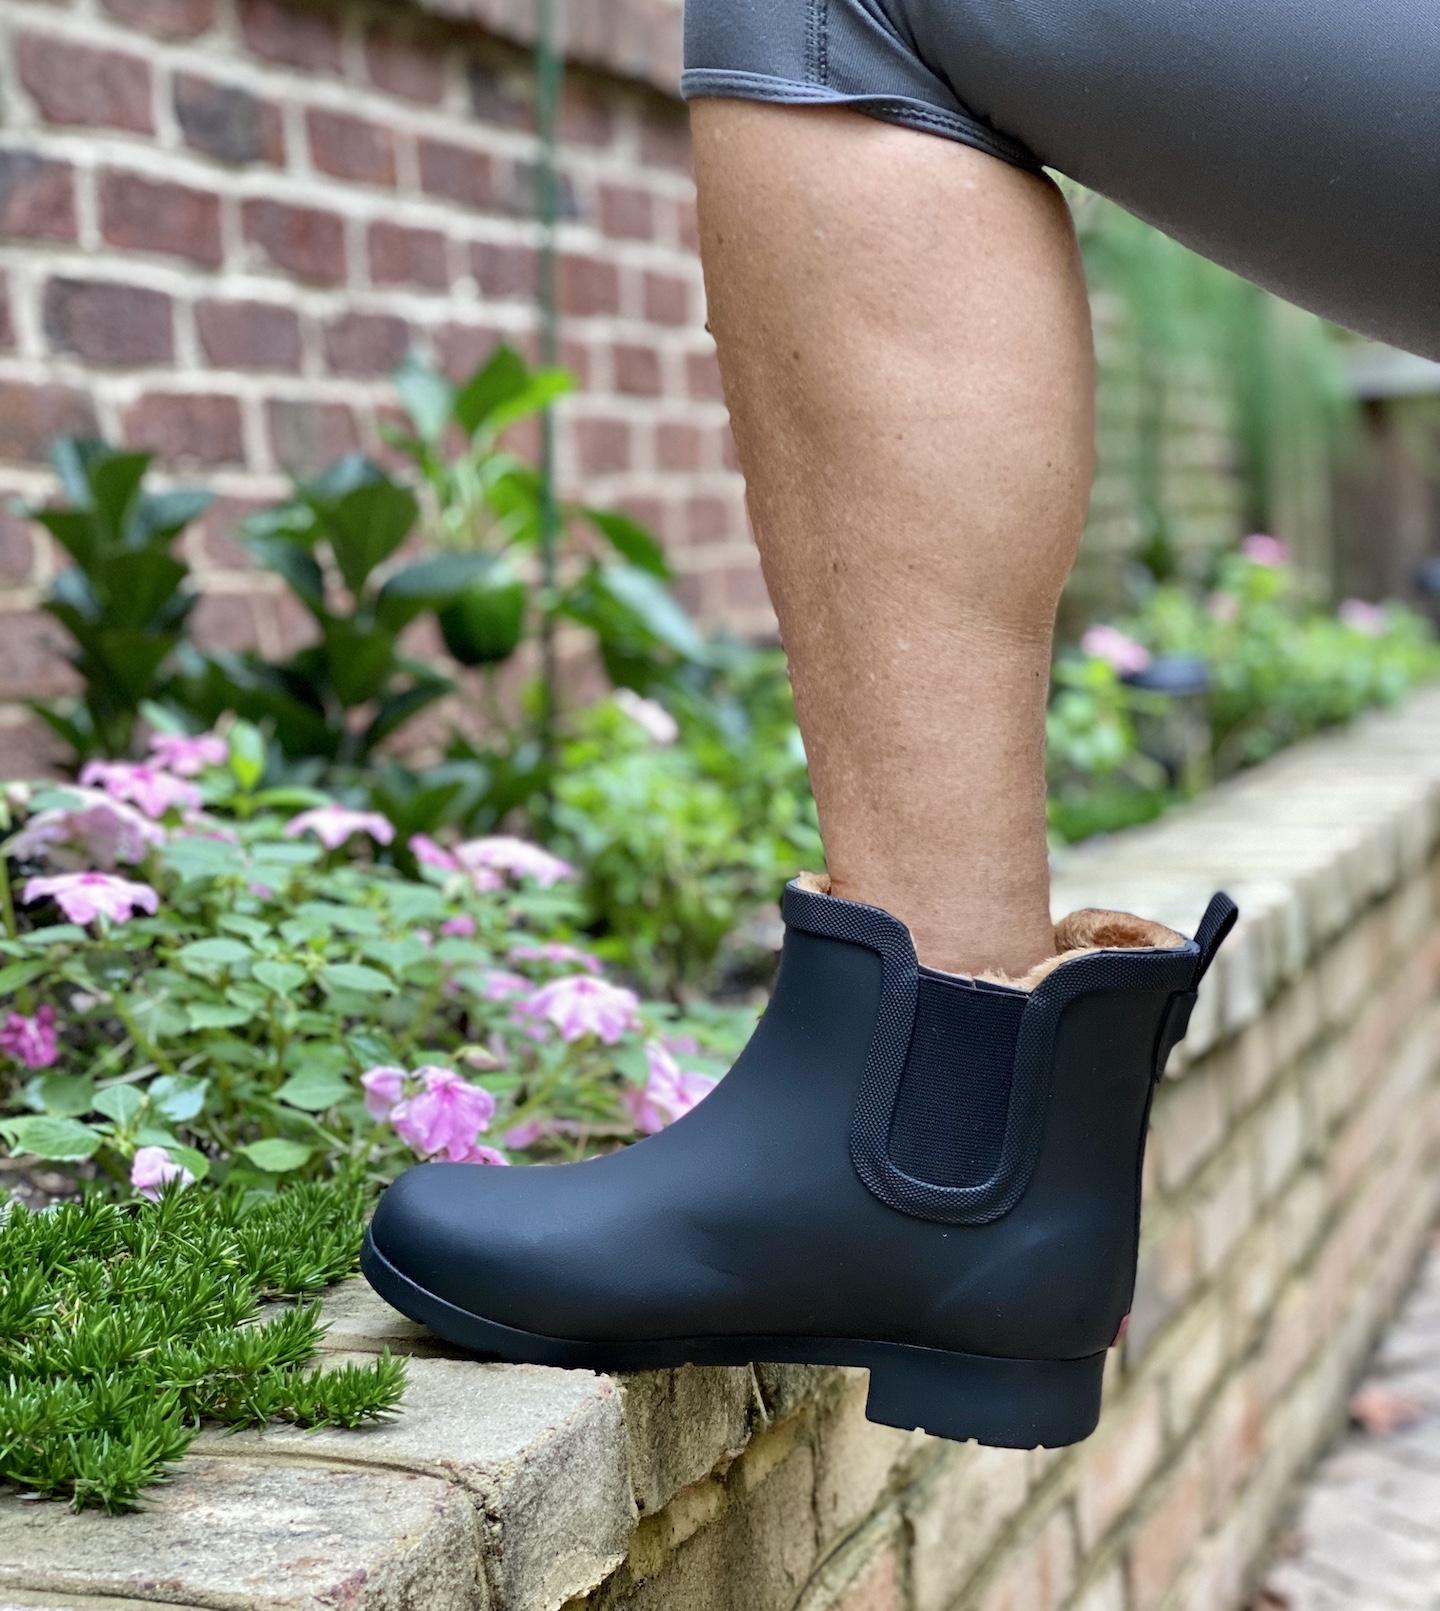 chooka® Boots at Costco! – The Costco